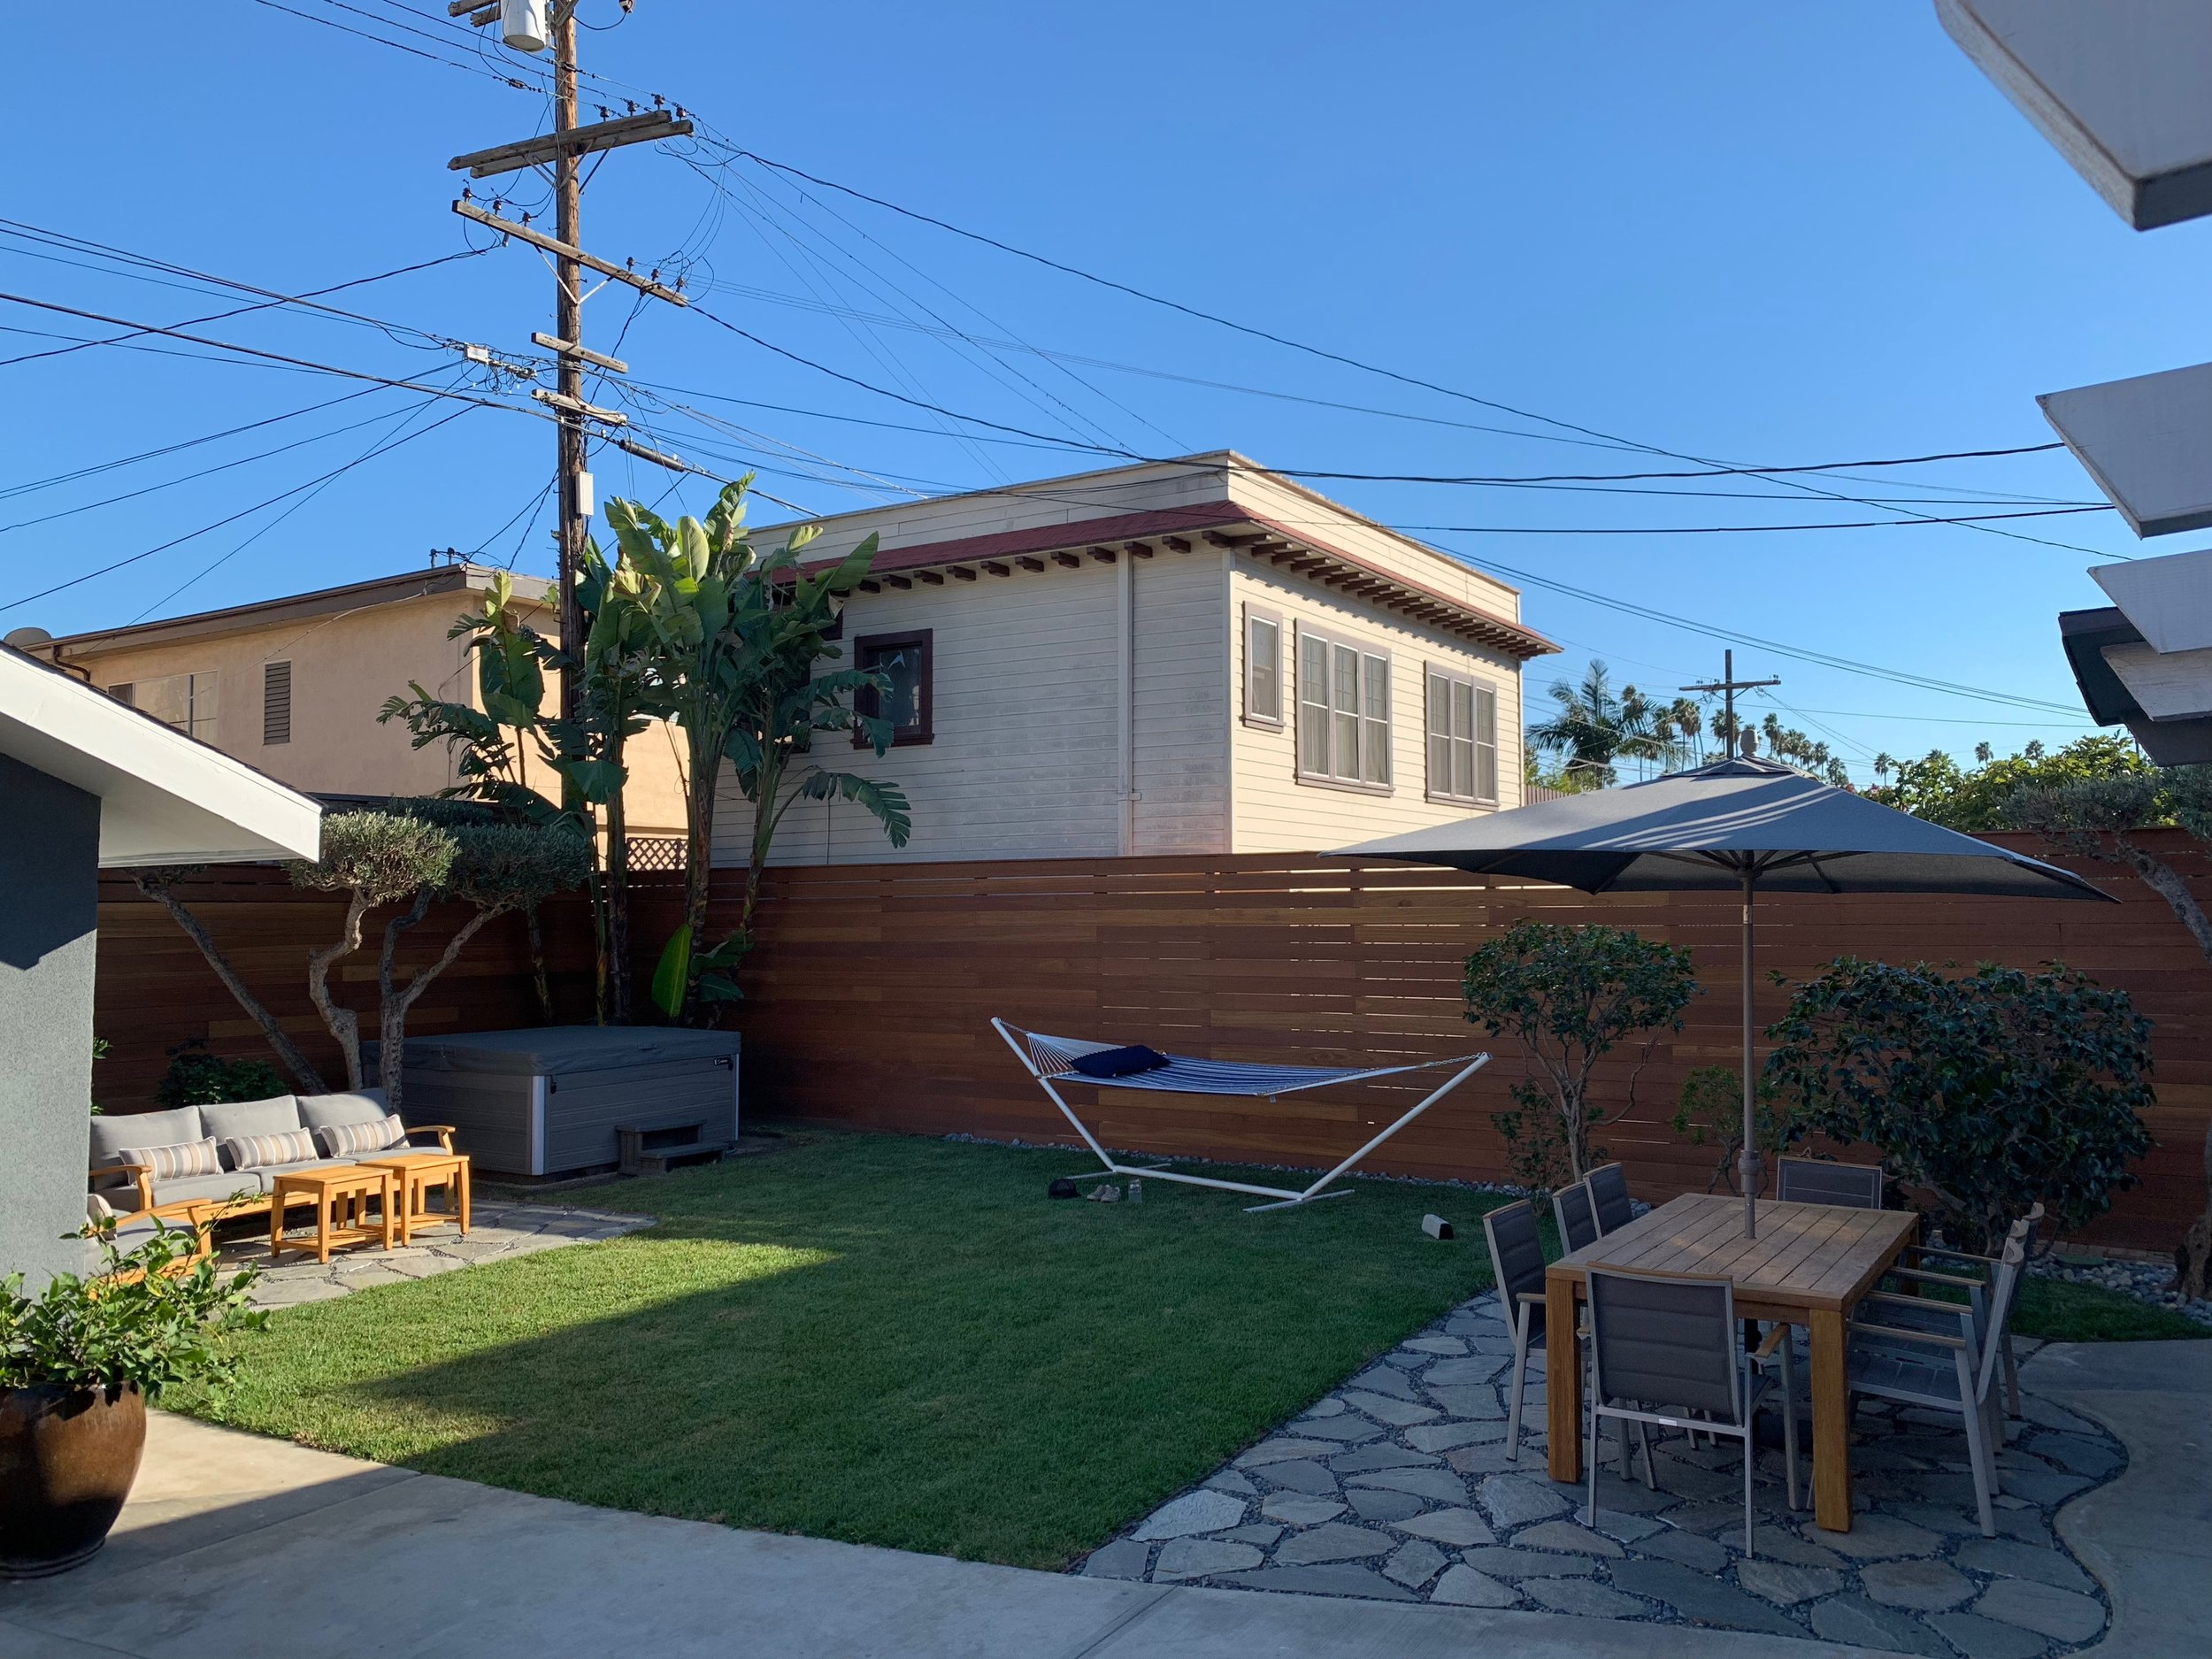 Los Angeles Fence Builders Horizontal Fence.jpeg